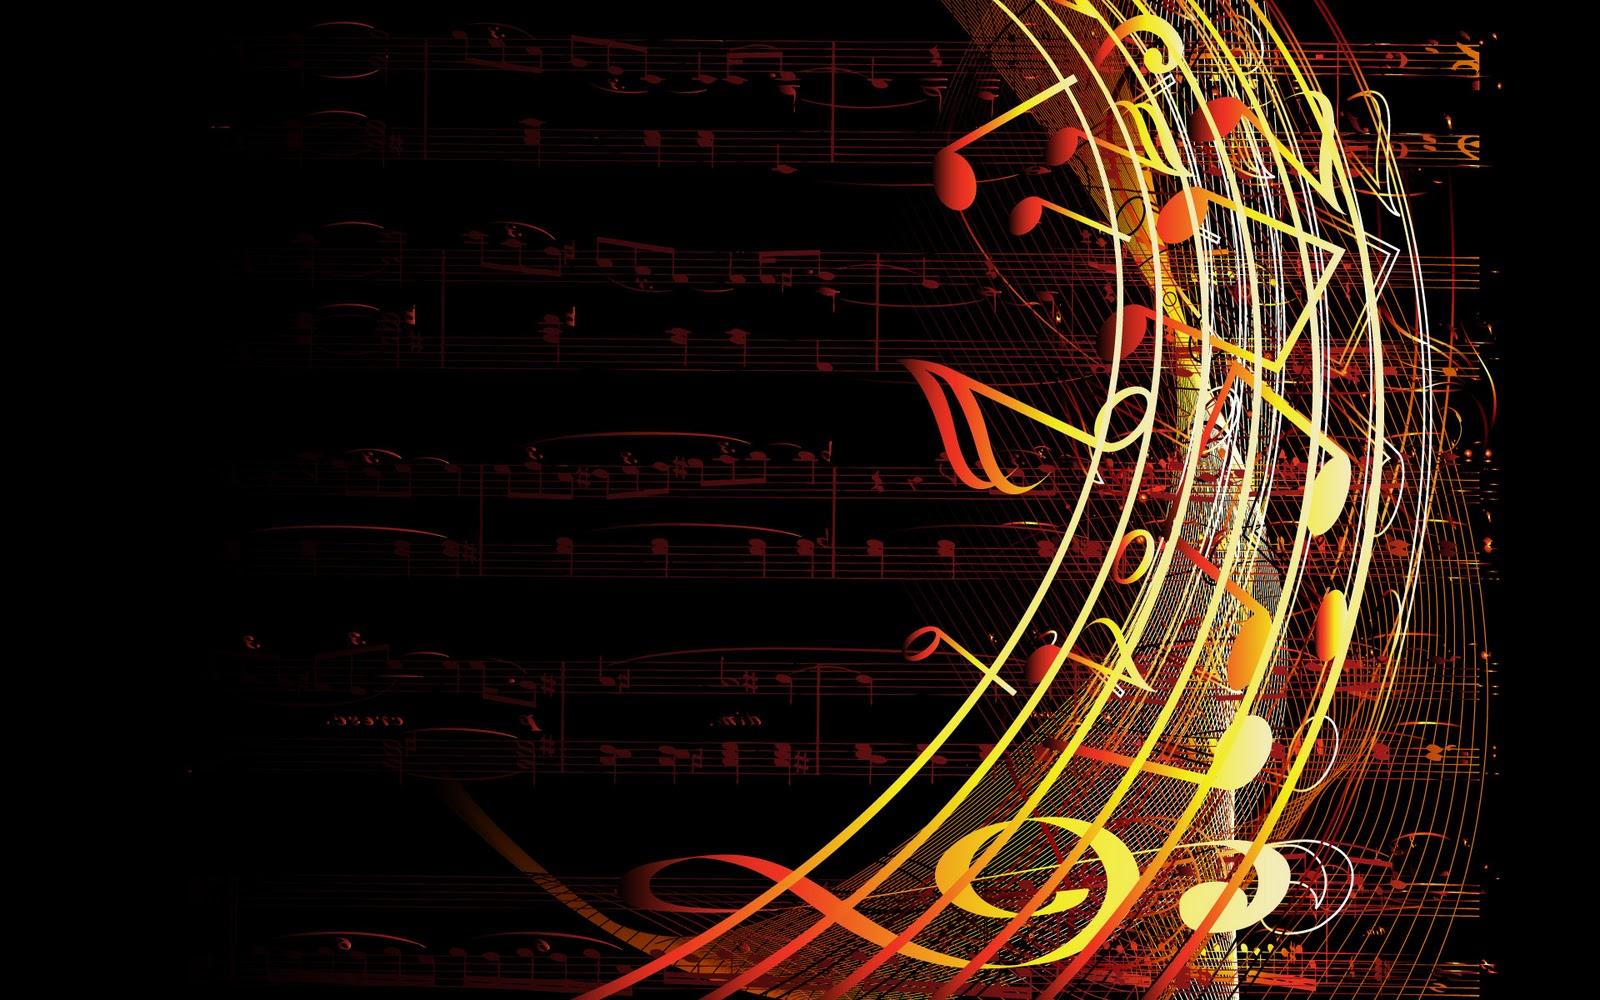 Abstract Music Notes Art: Muziek Achtergronden